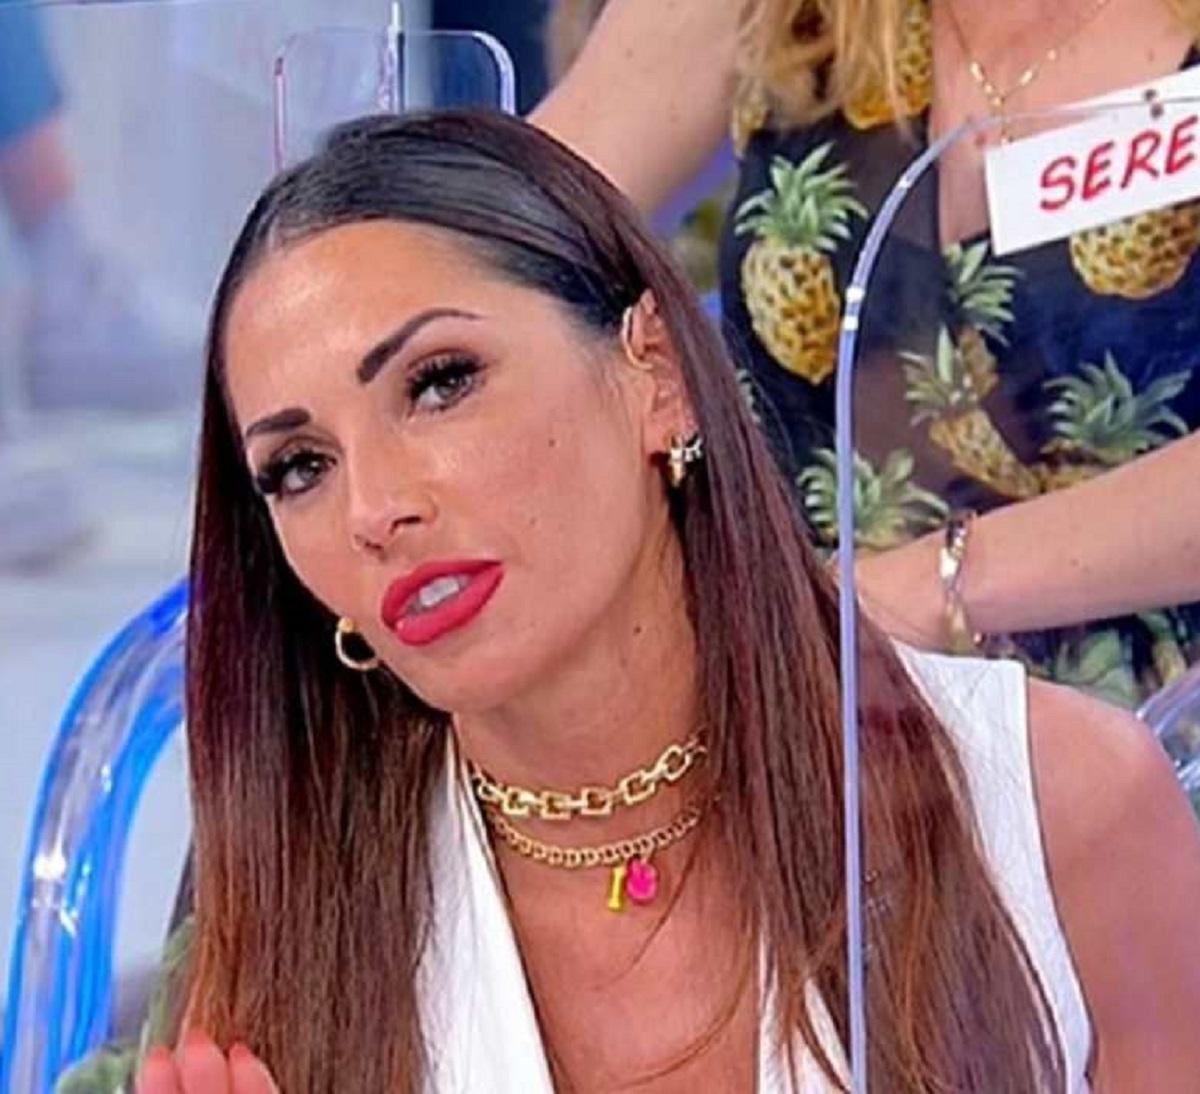 Ida Platano UeD Marcello Gemma Galgani Tina Cipollari indiscrezioni